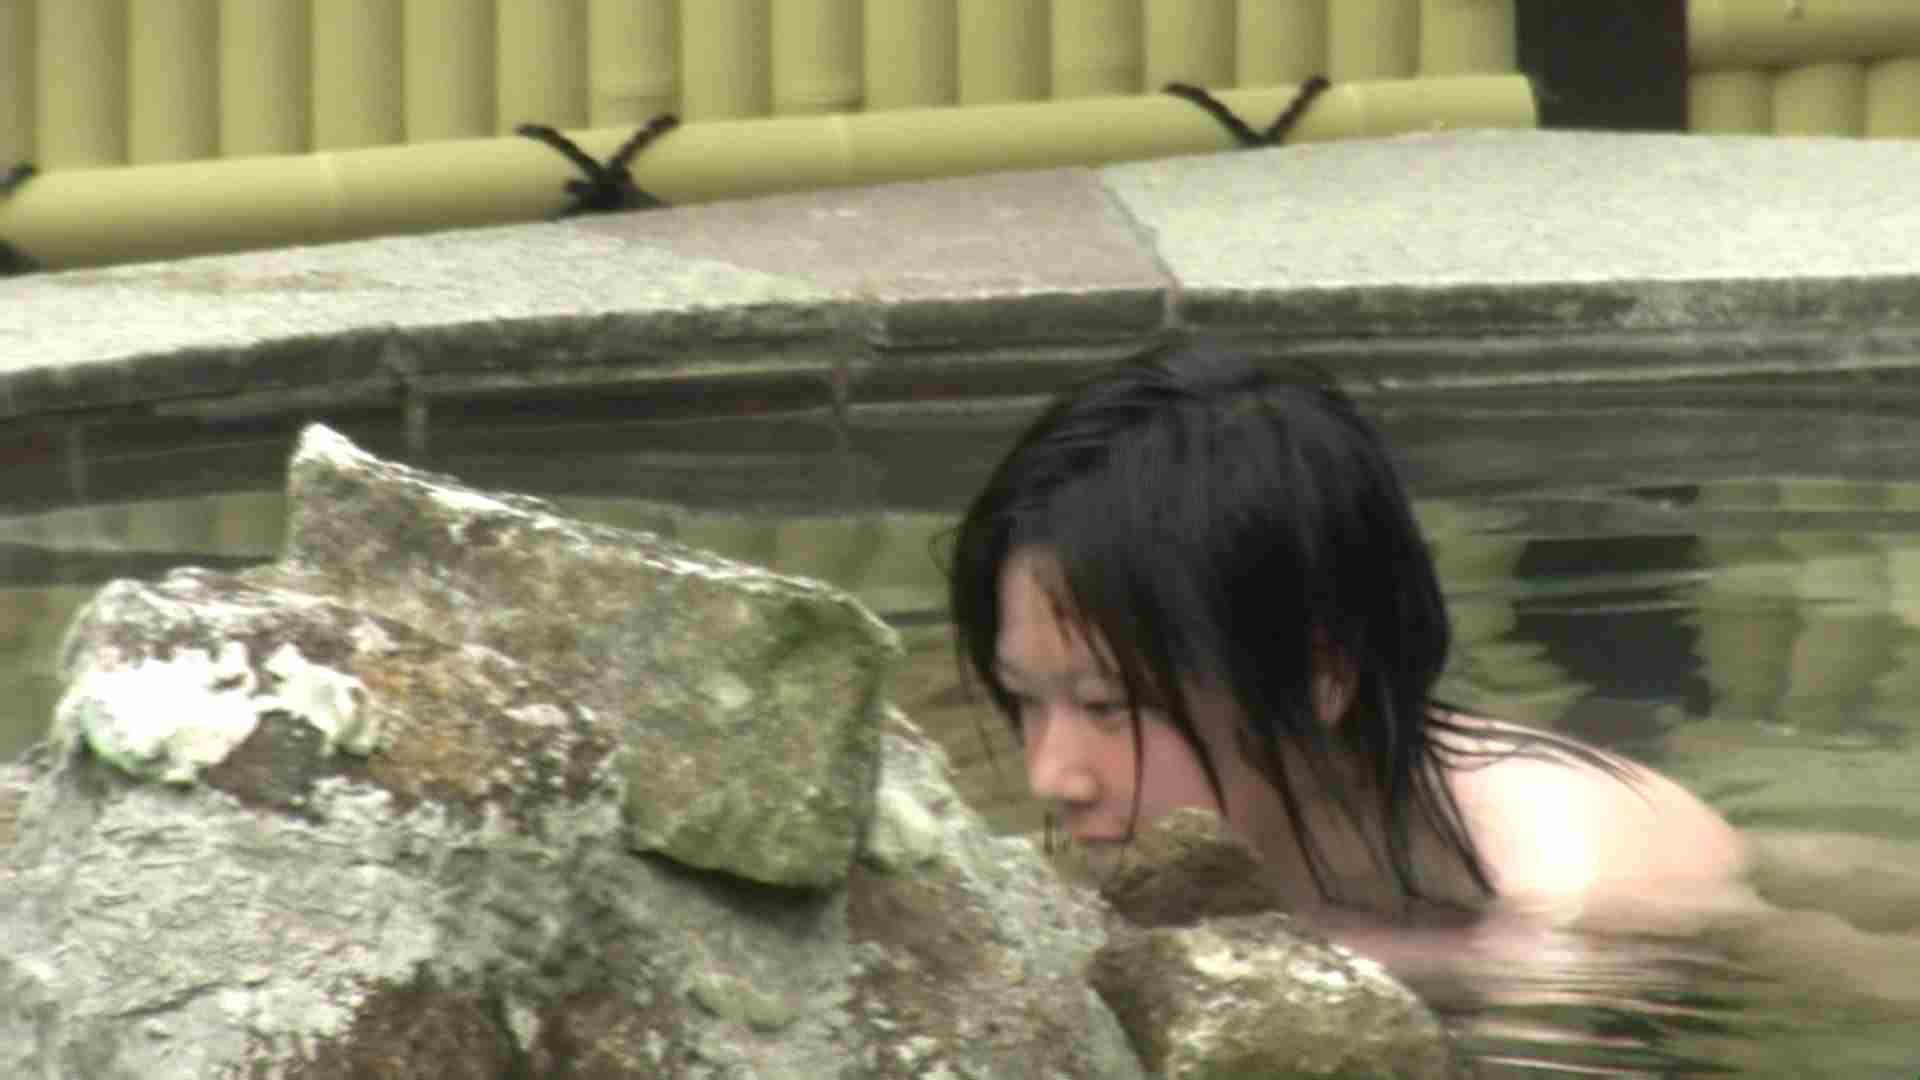 Aquaな露天風呂Vol.36 OL女体  78連発 78